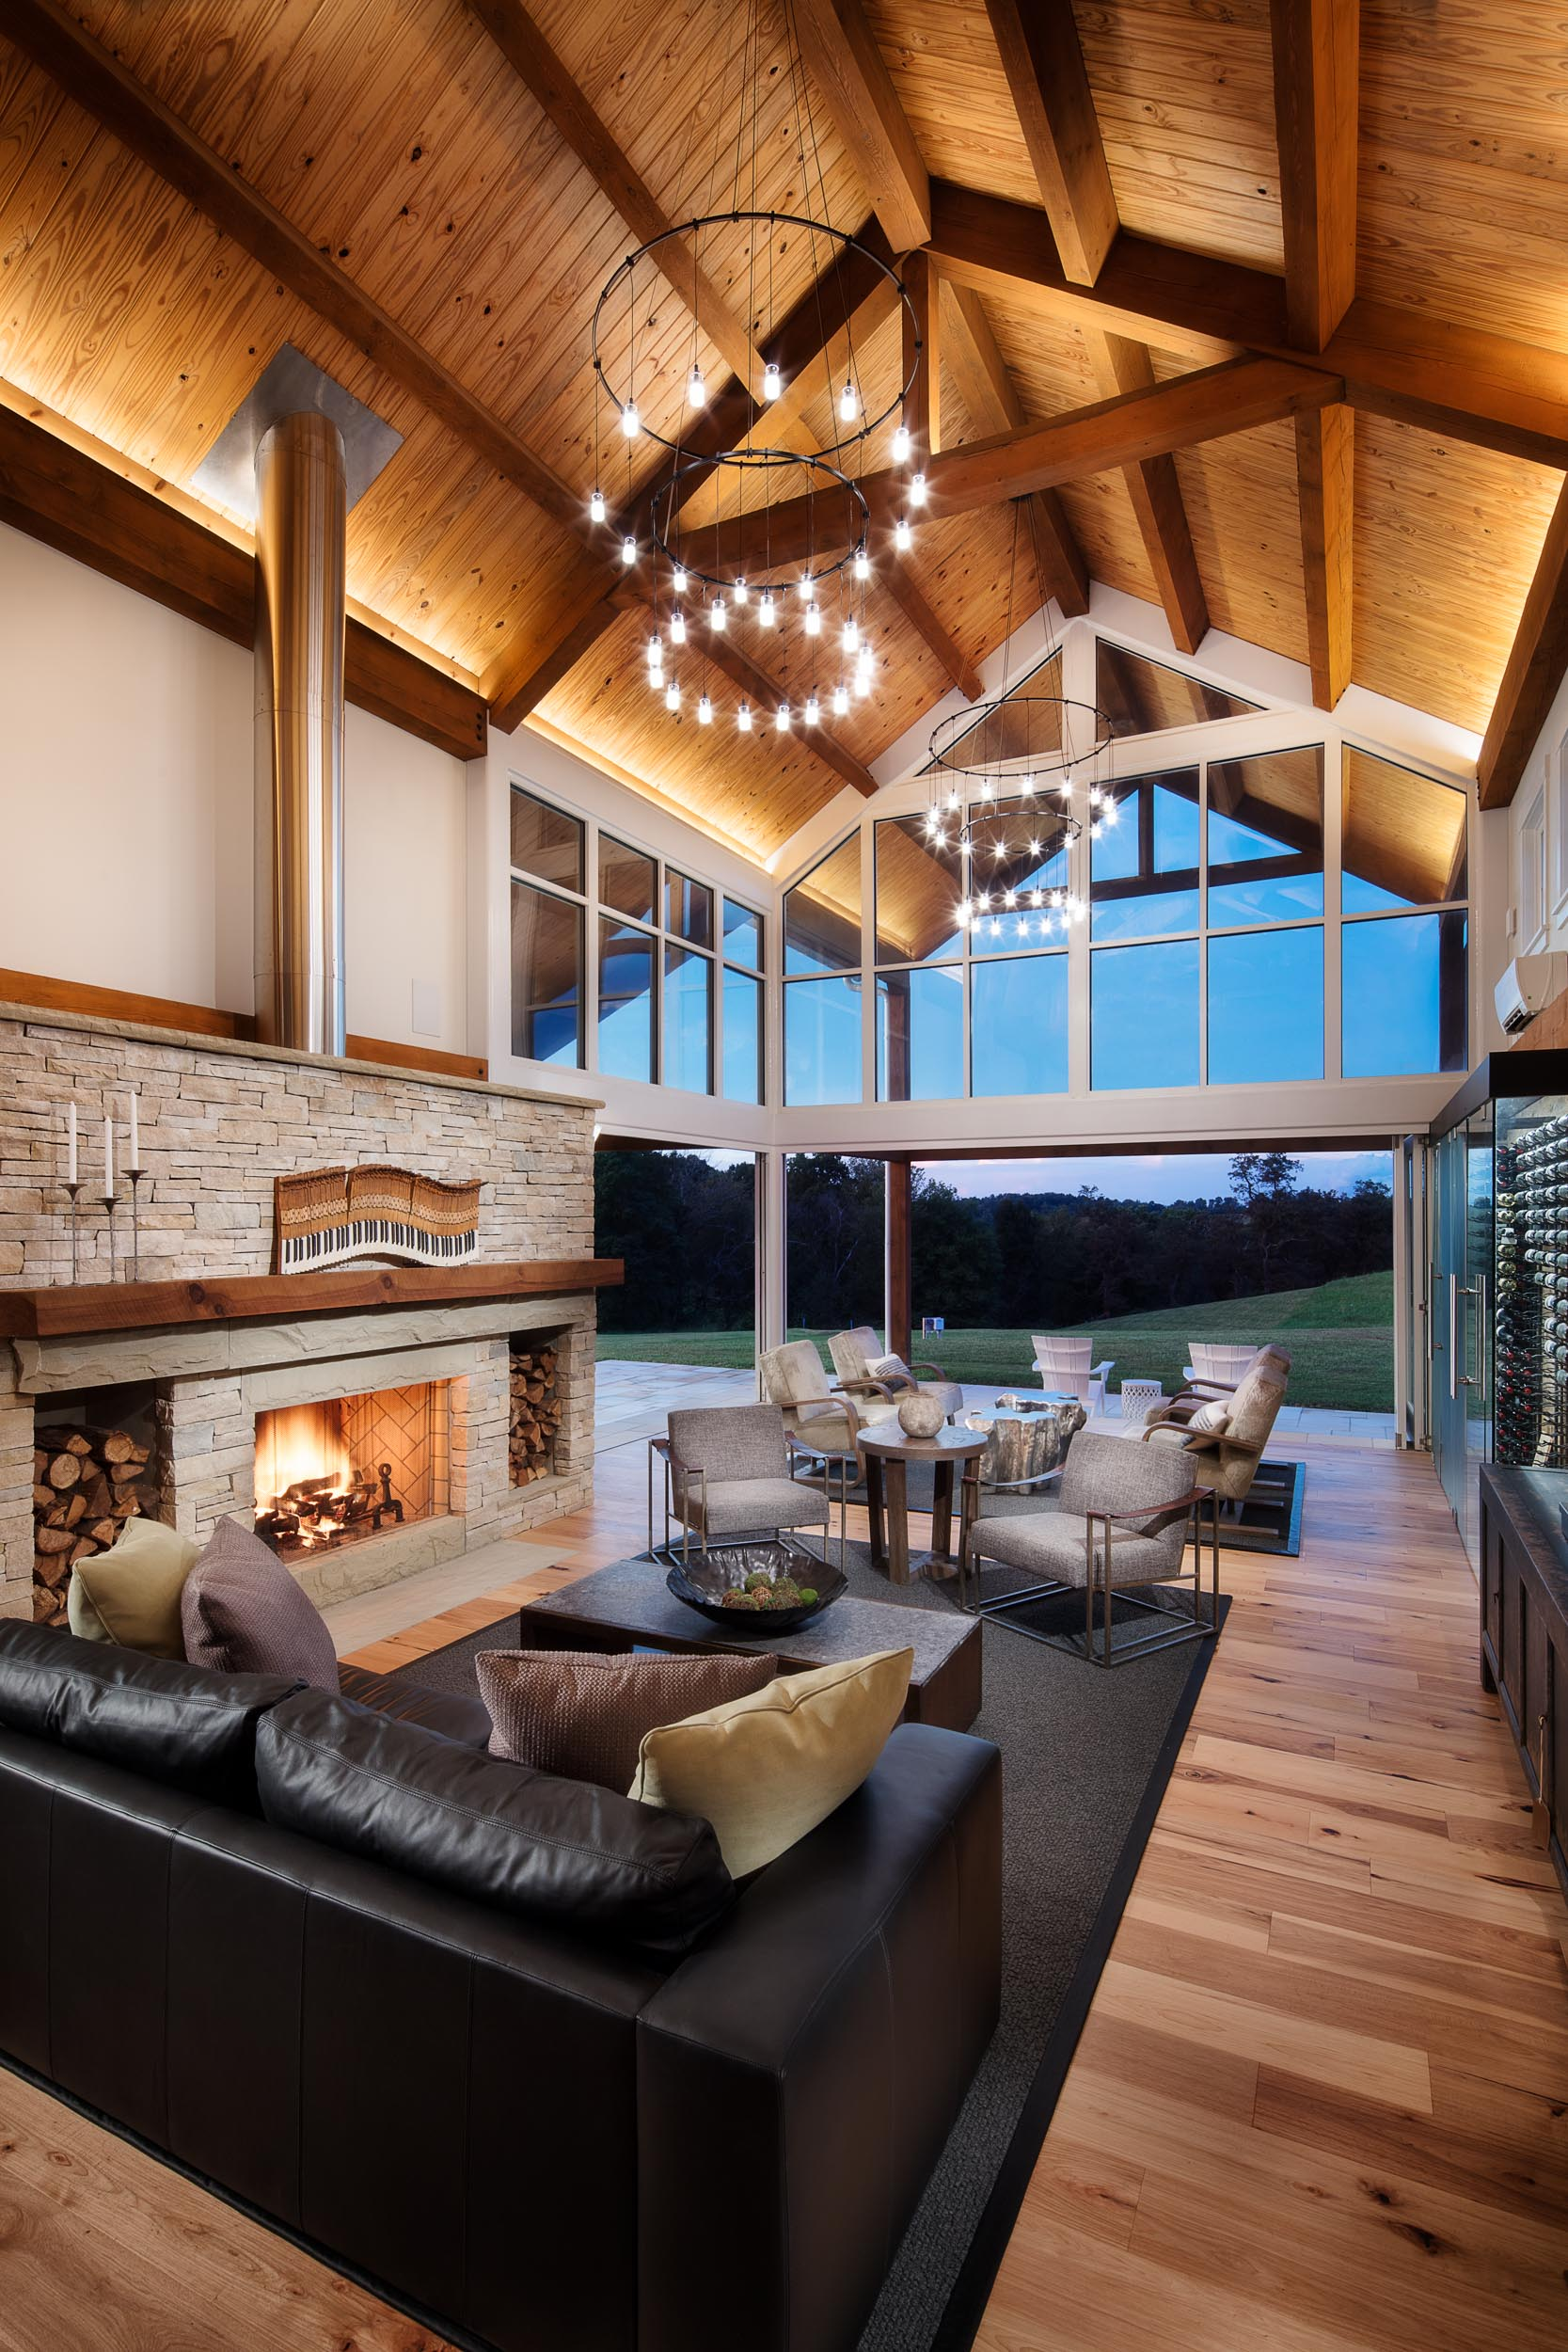 home_barn_upscale_country_grealish-19.jpg